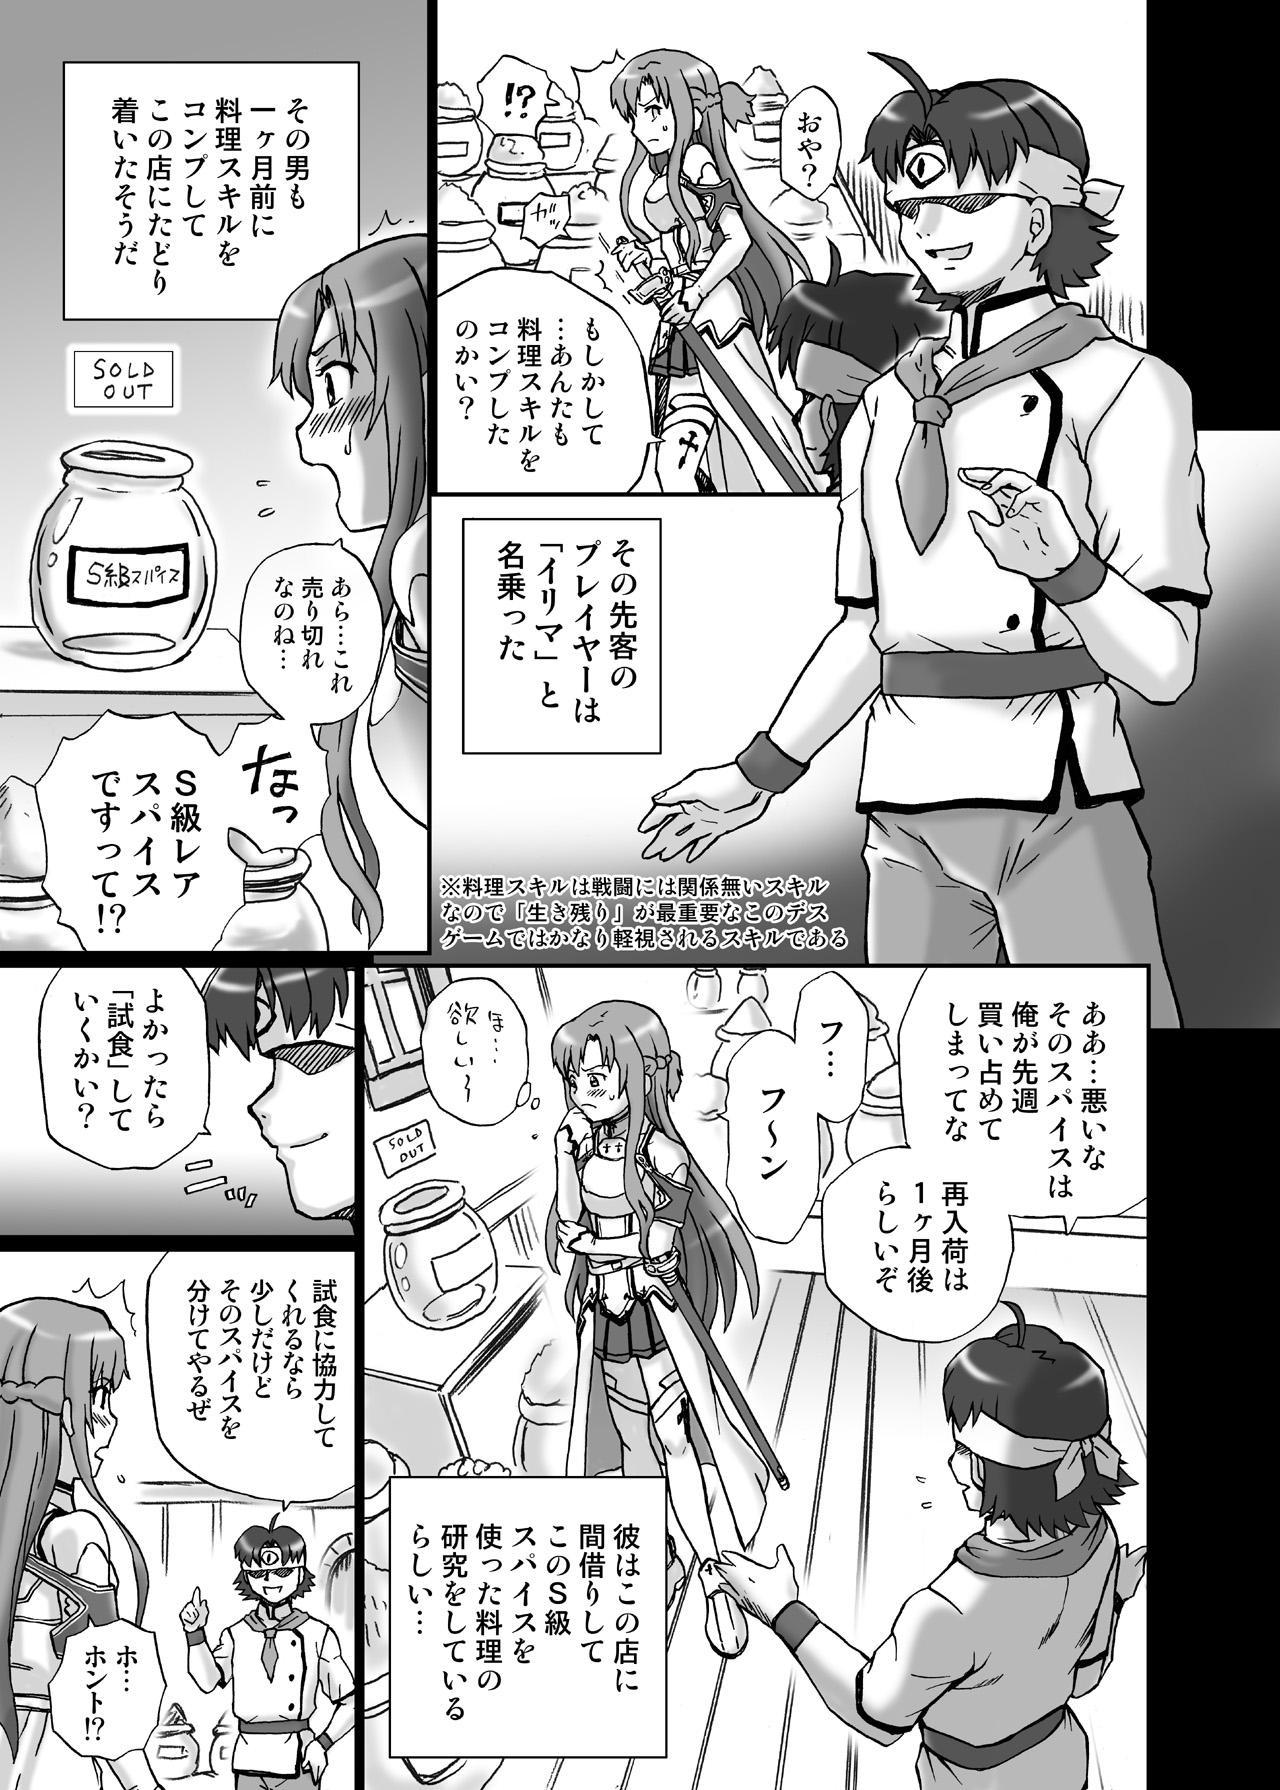 TAIL-MAN ASUNA BOOK 3